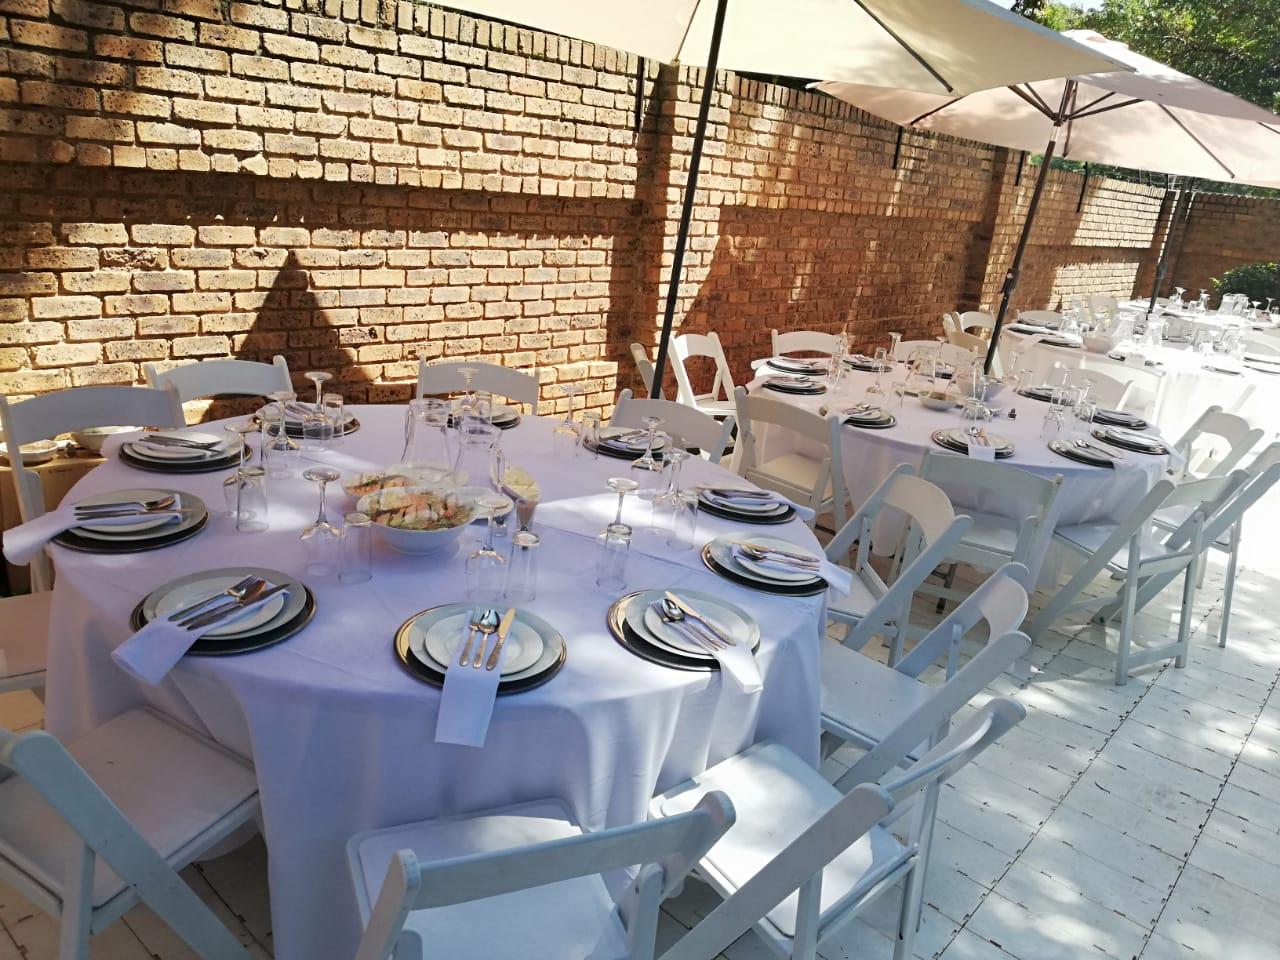 Wedding decor, anniversary, baby shower, kiddies parties etc